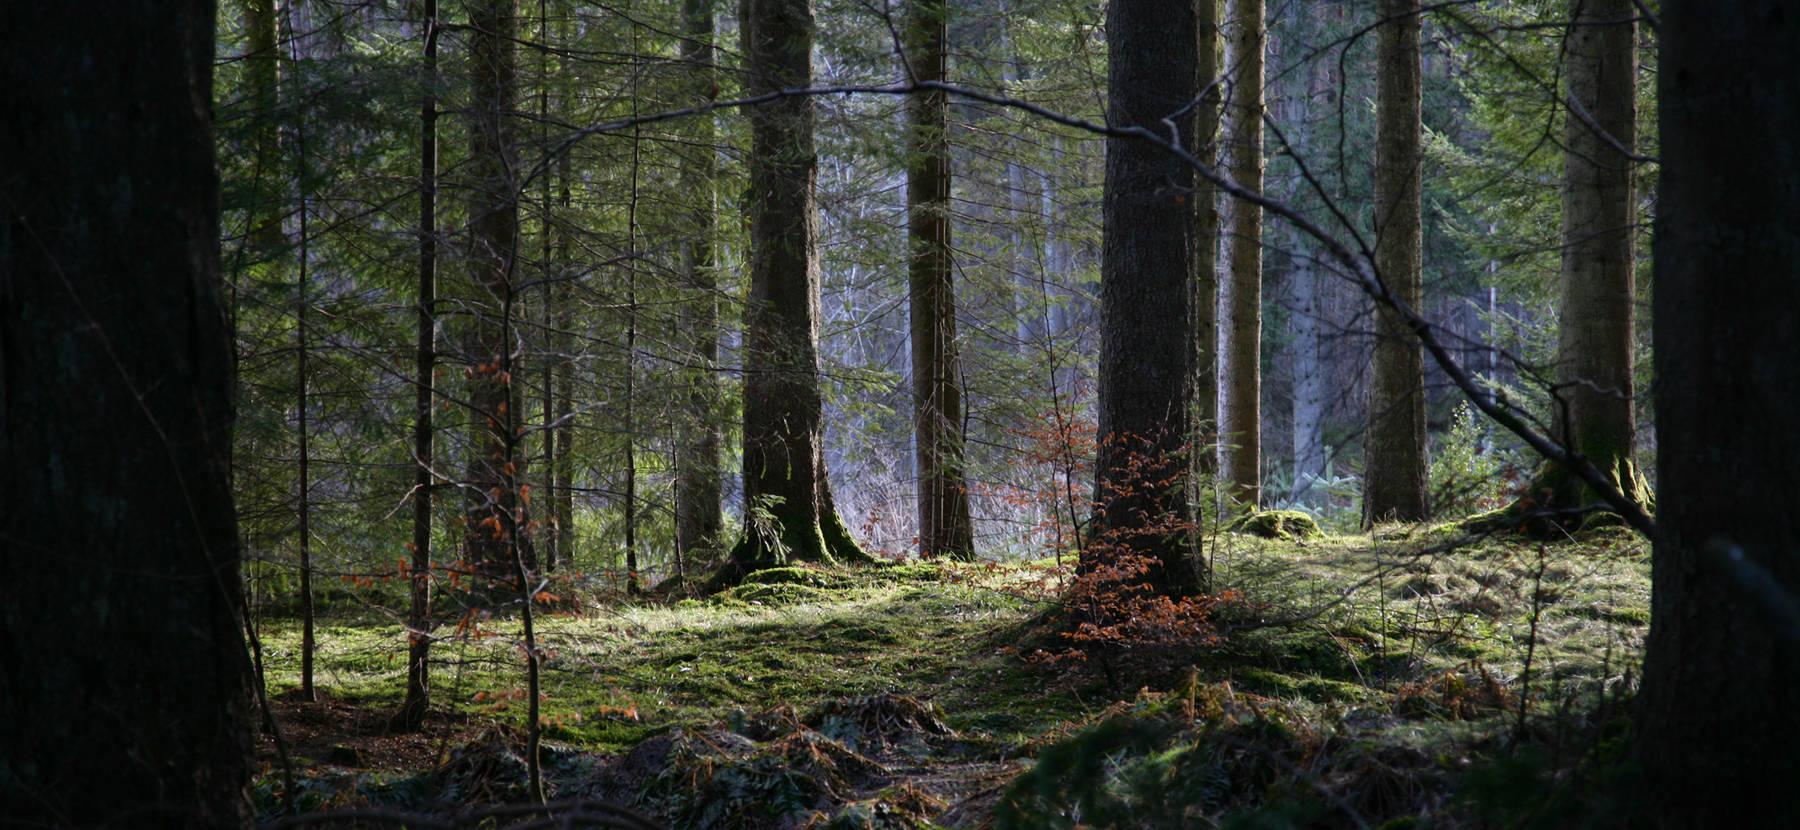 Dunkeld and Birnam Hermitage walk Douglas firs